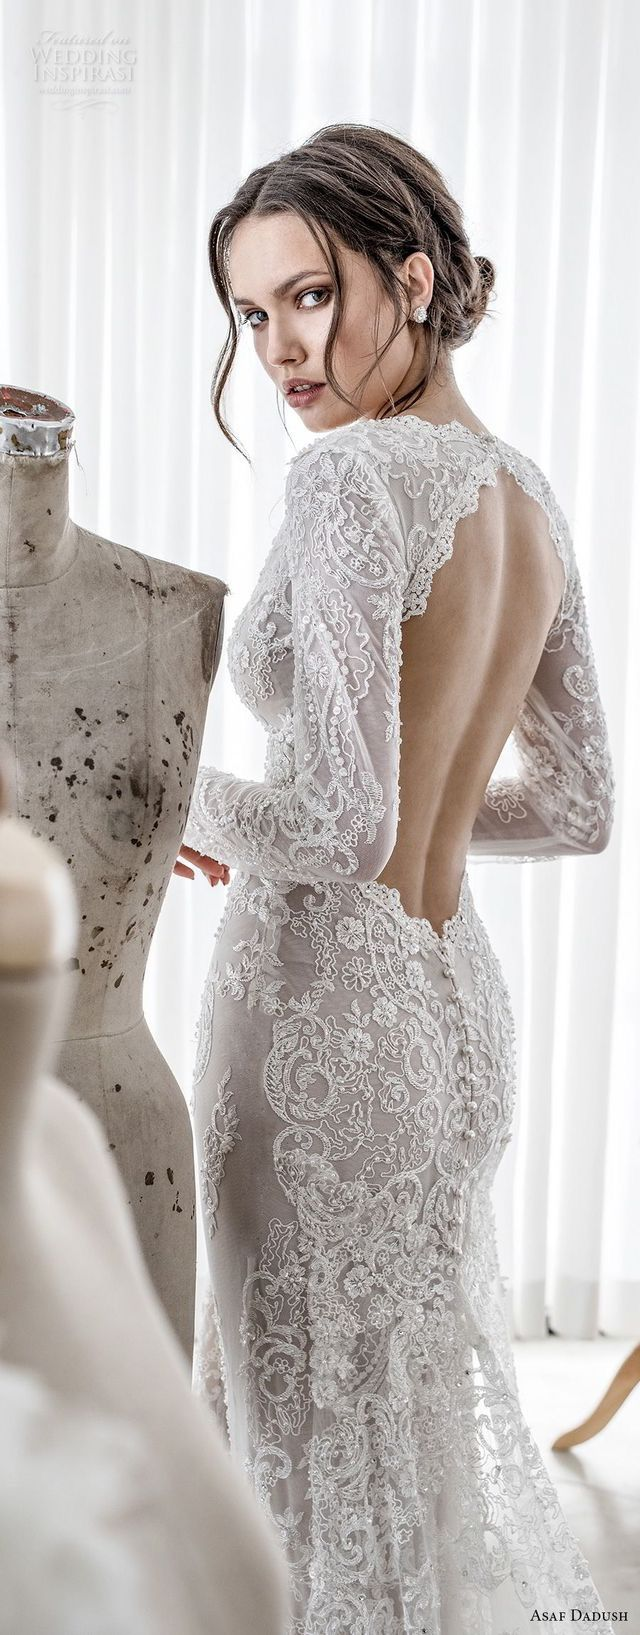 Pin by odi gamarra on dresses pinterest wedding dress wedding